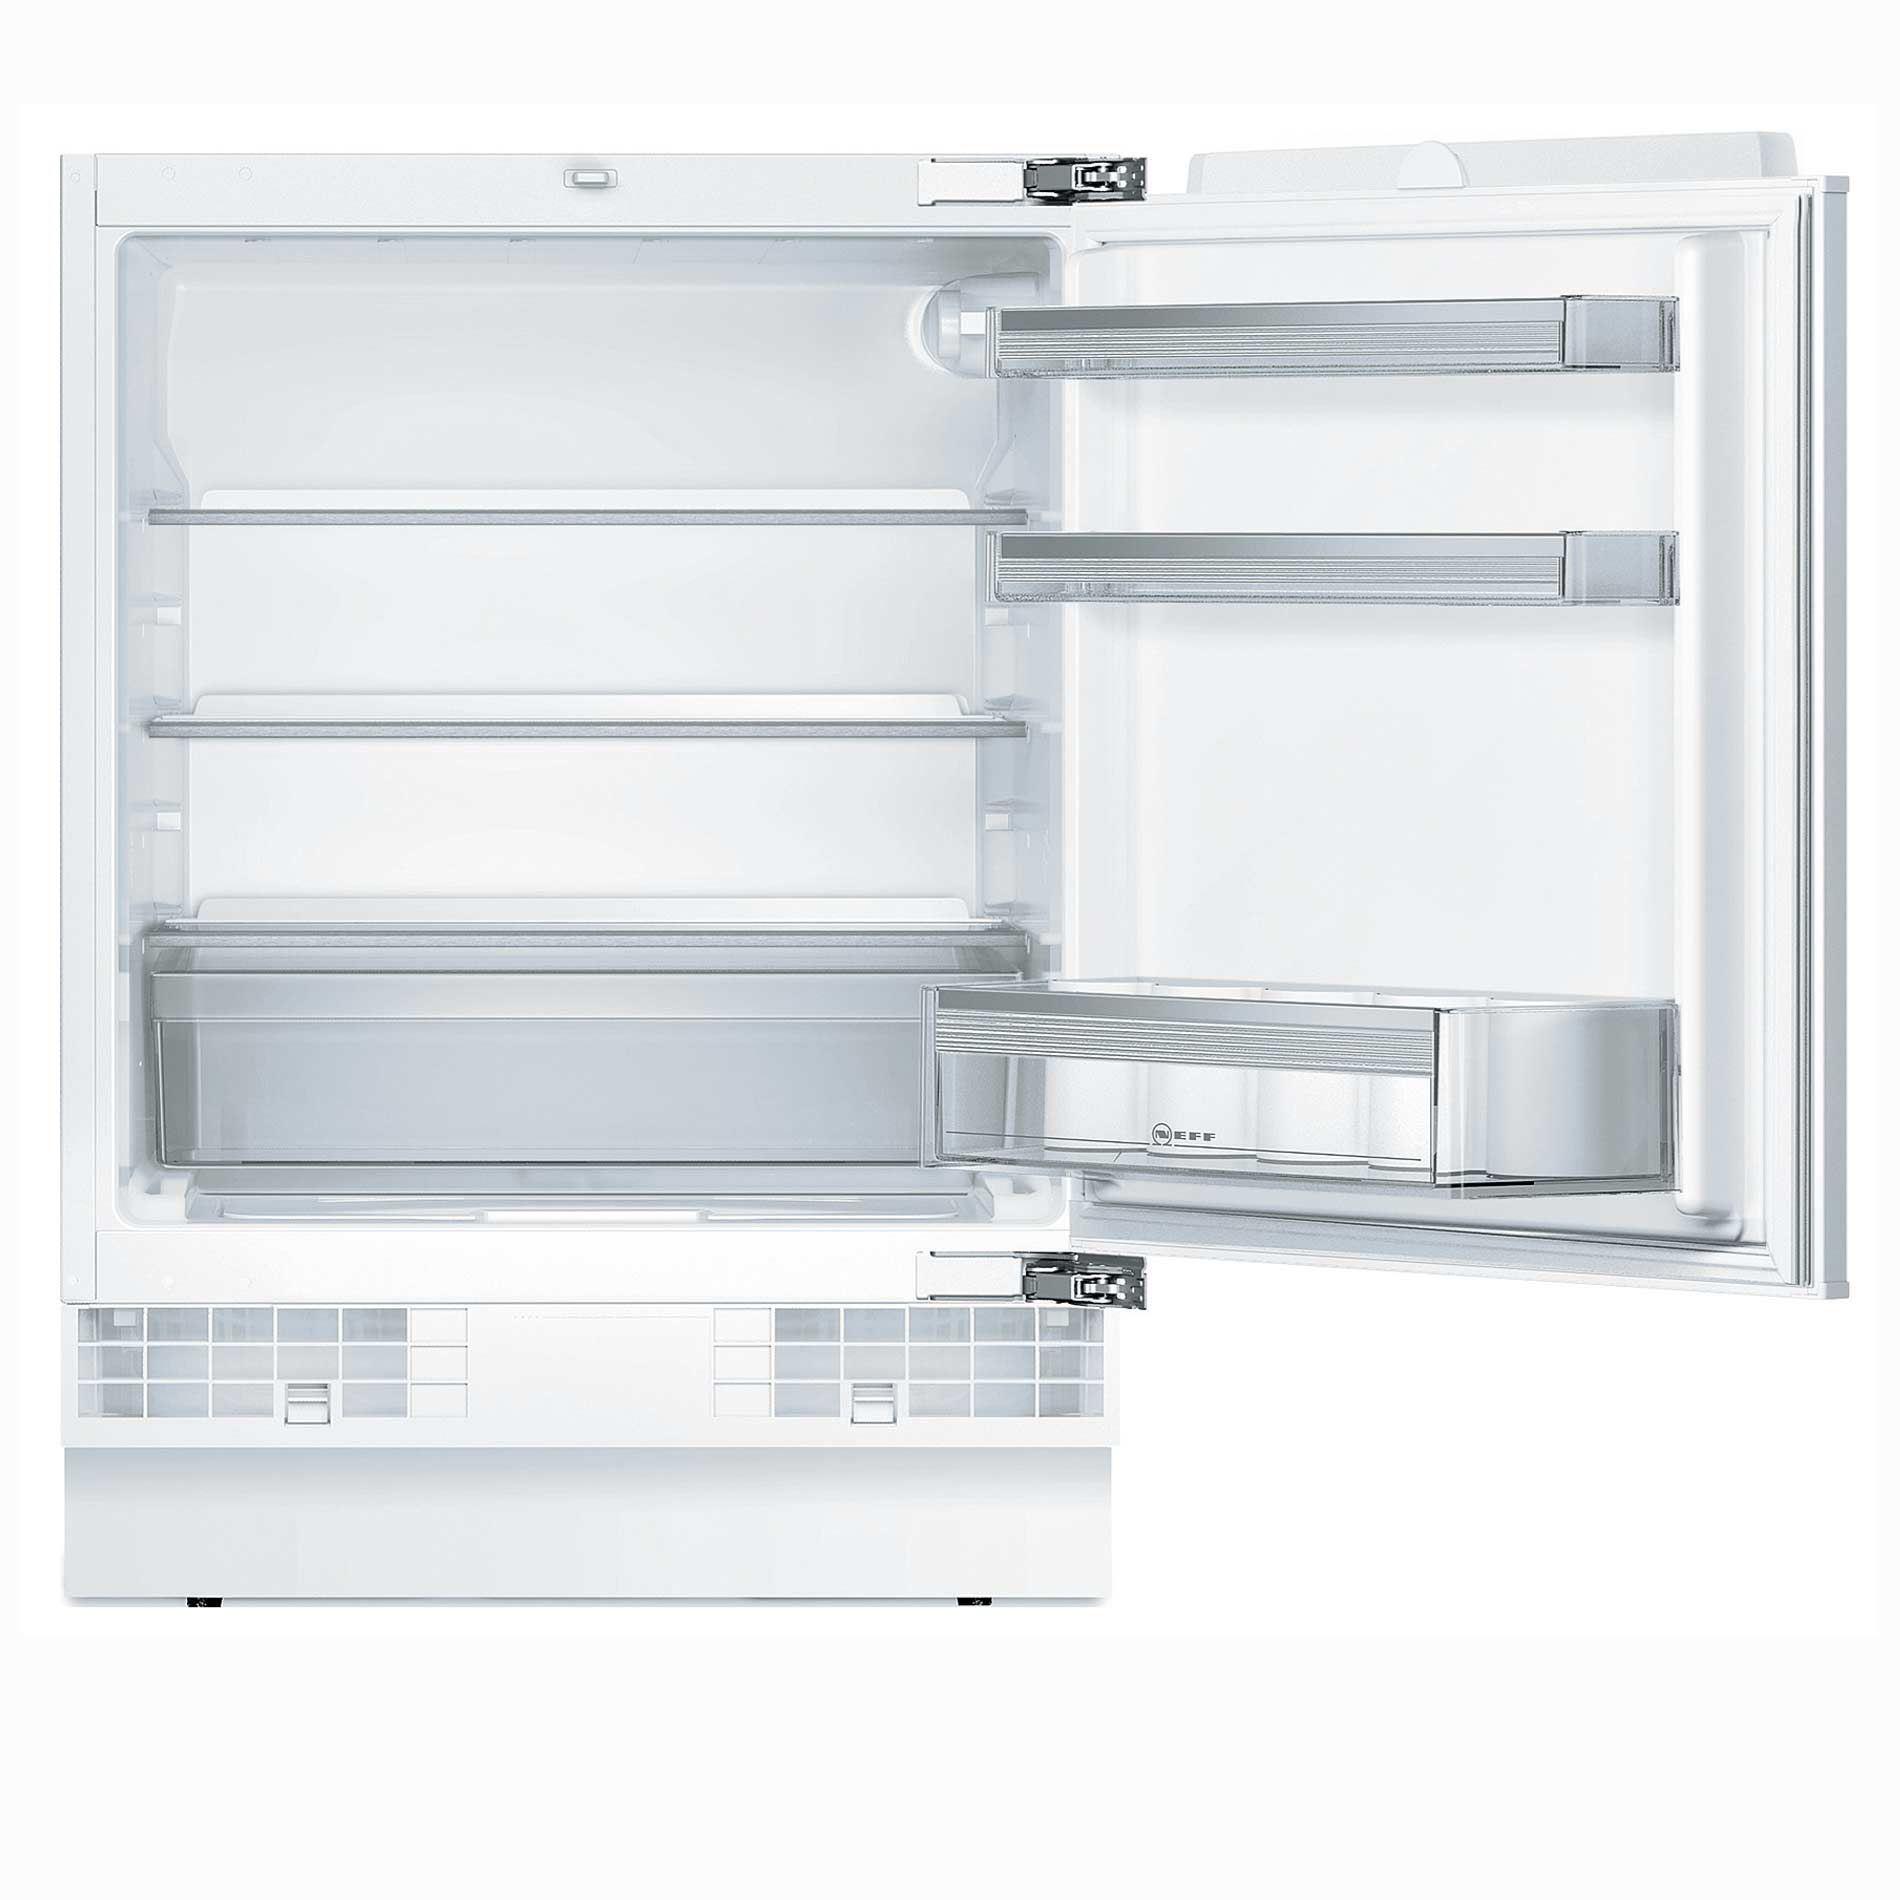 Neff K4316x7gb Built Under Fridge Appliance Source